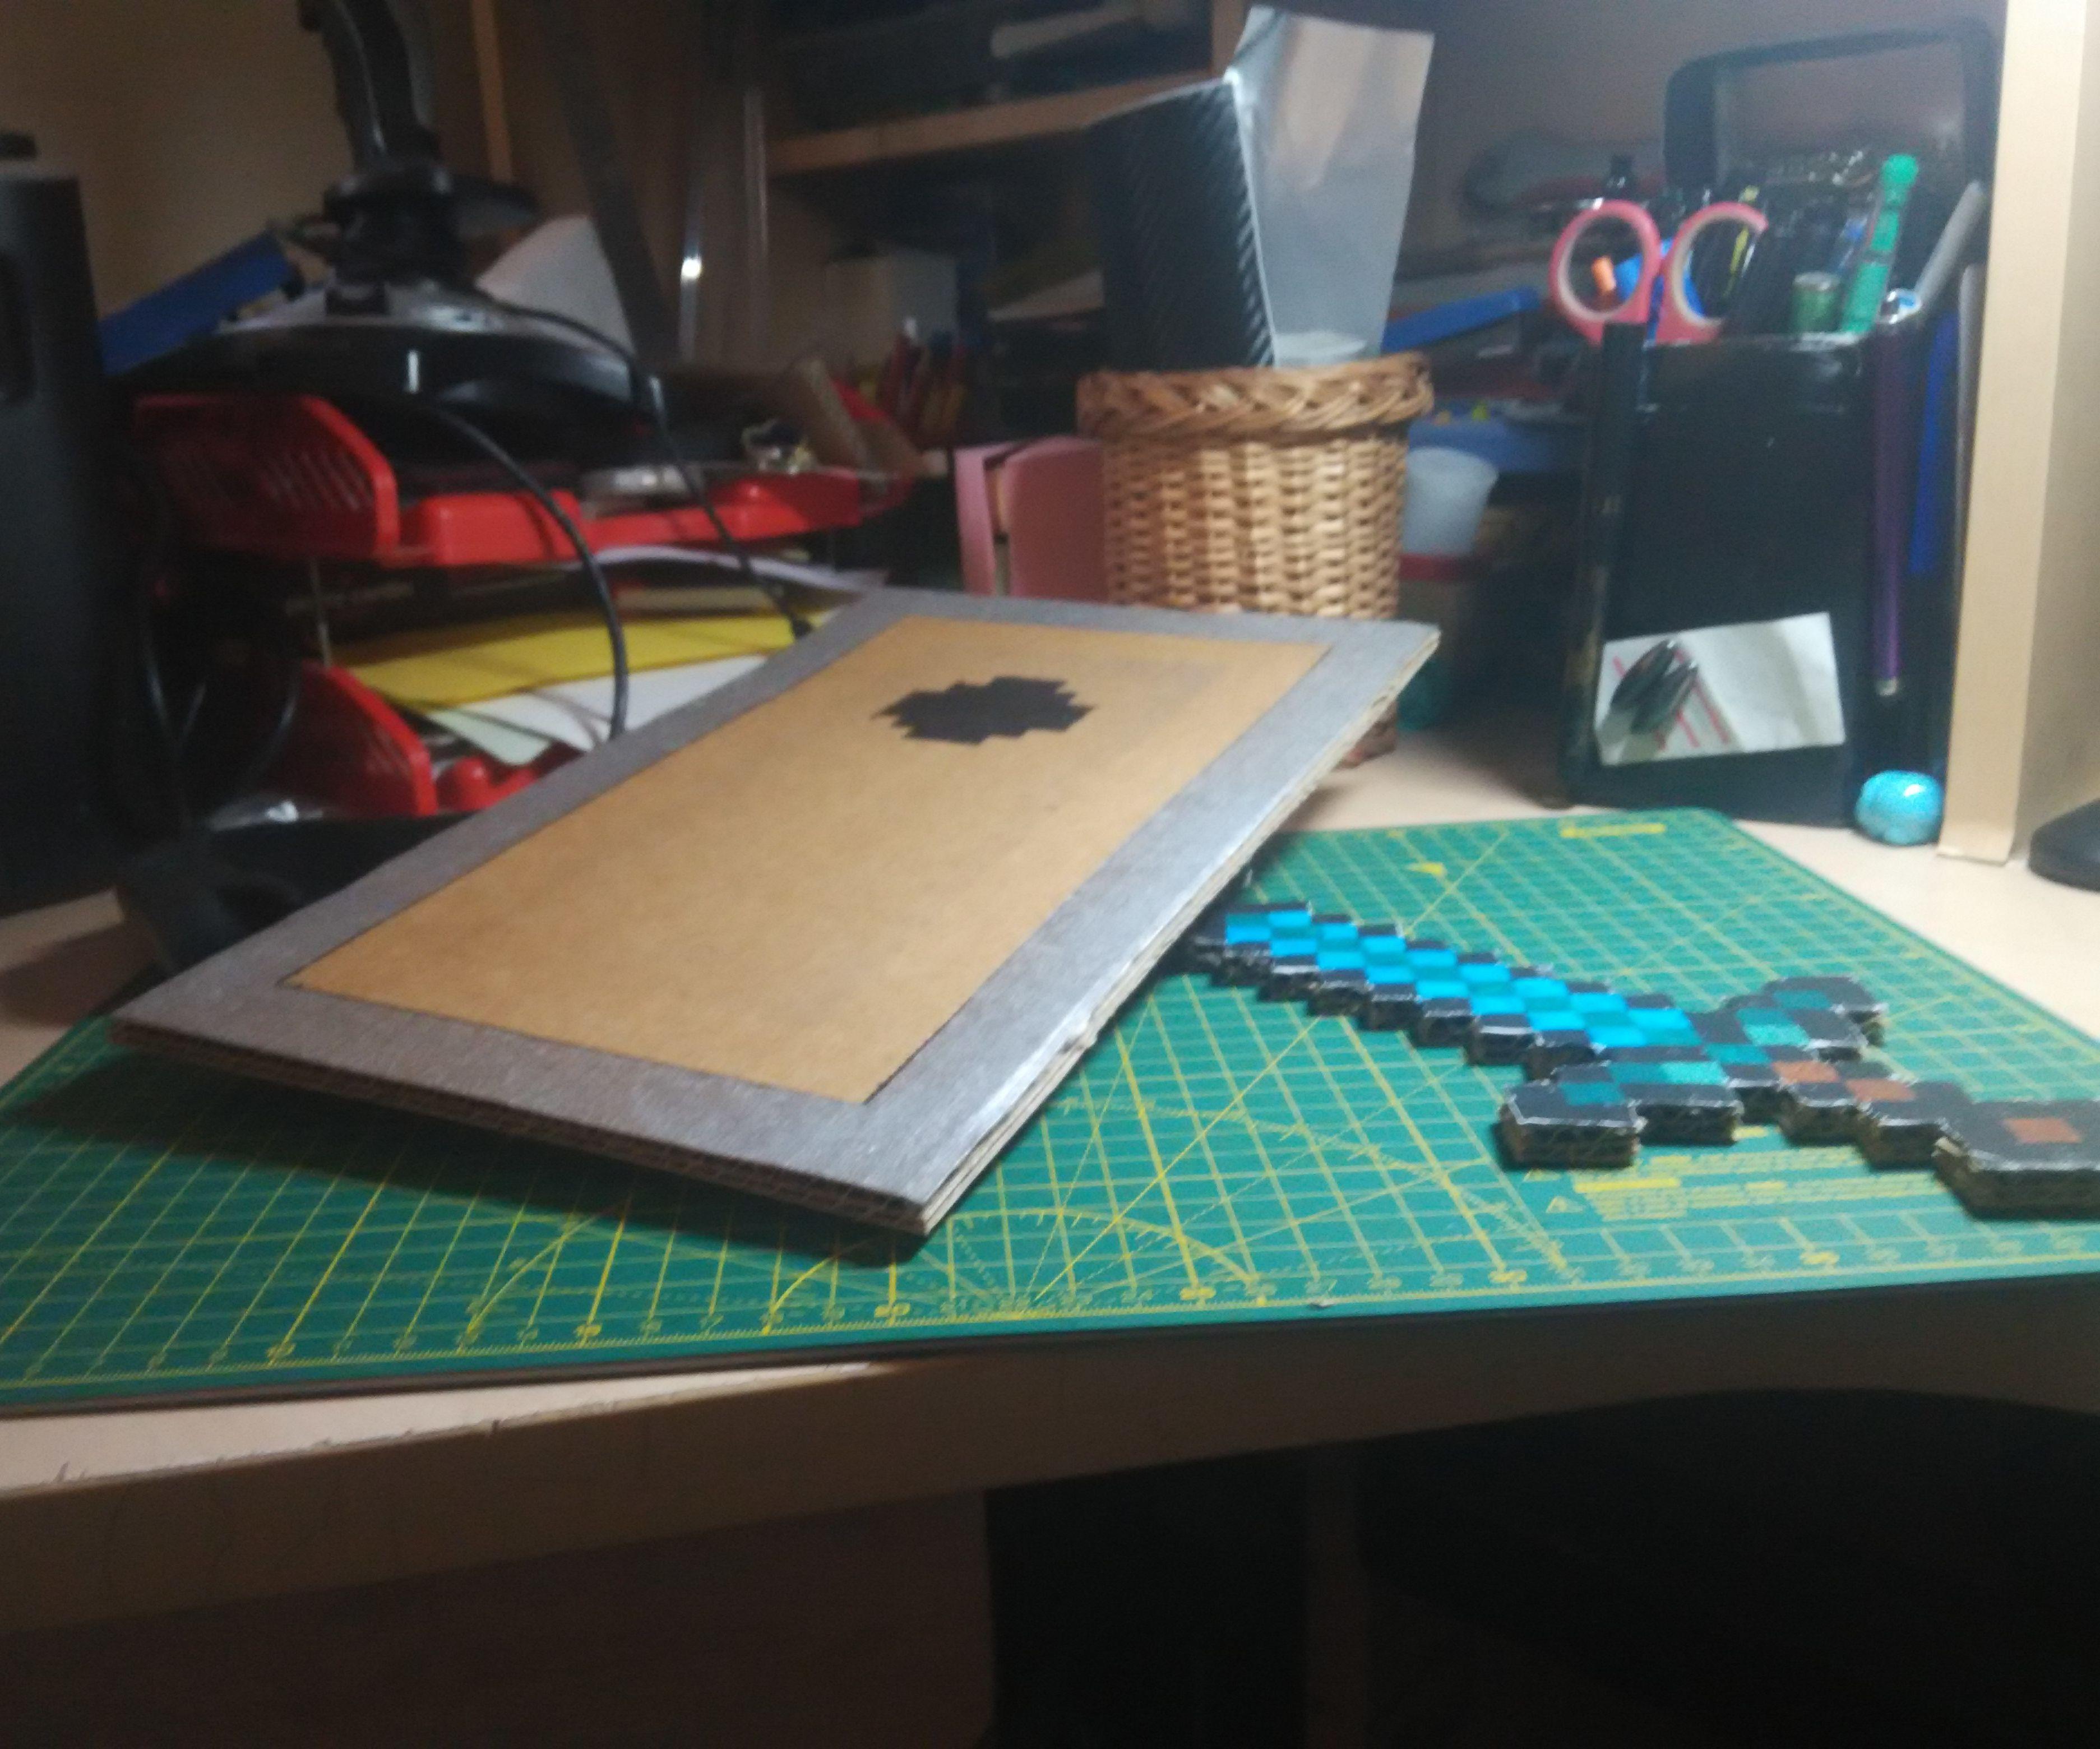 [DIY] Minecraft Shield and Sword